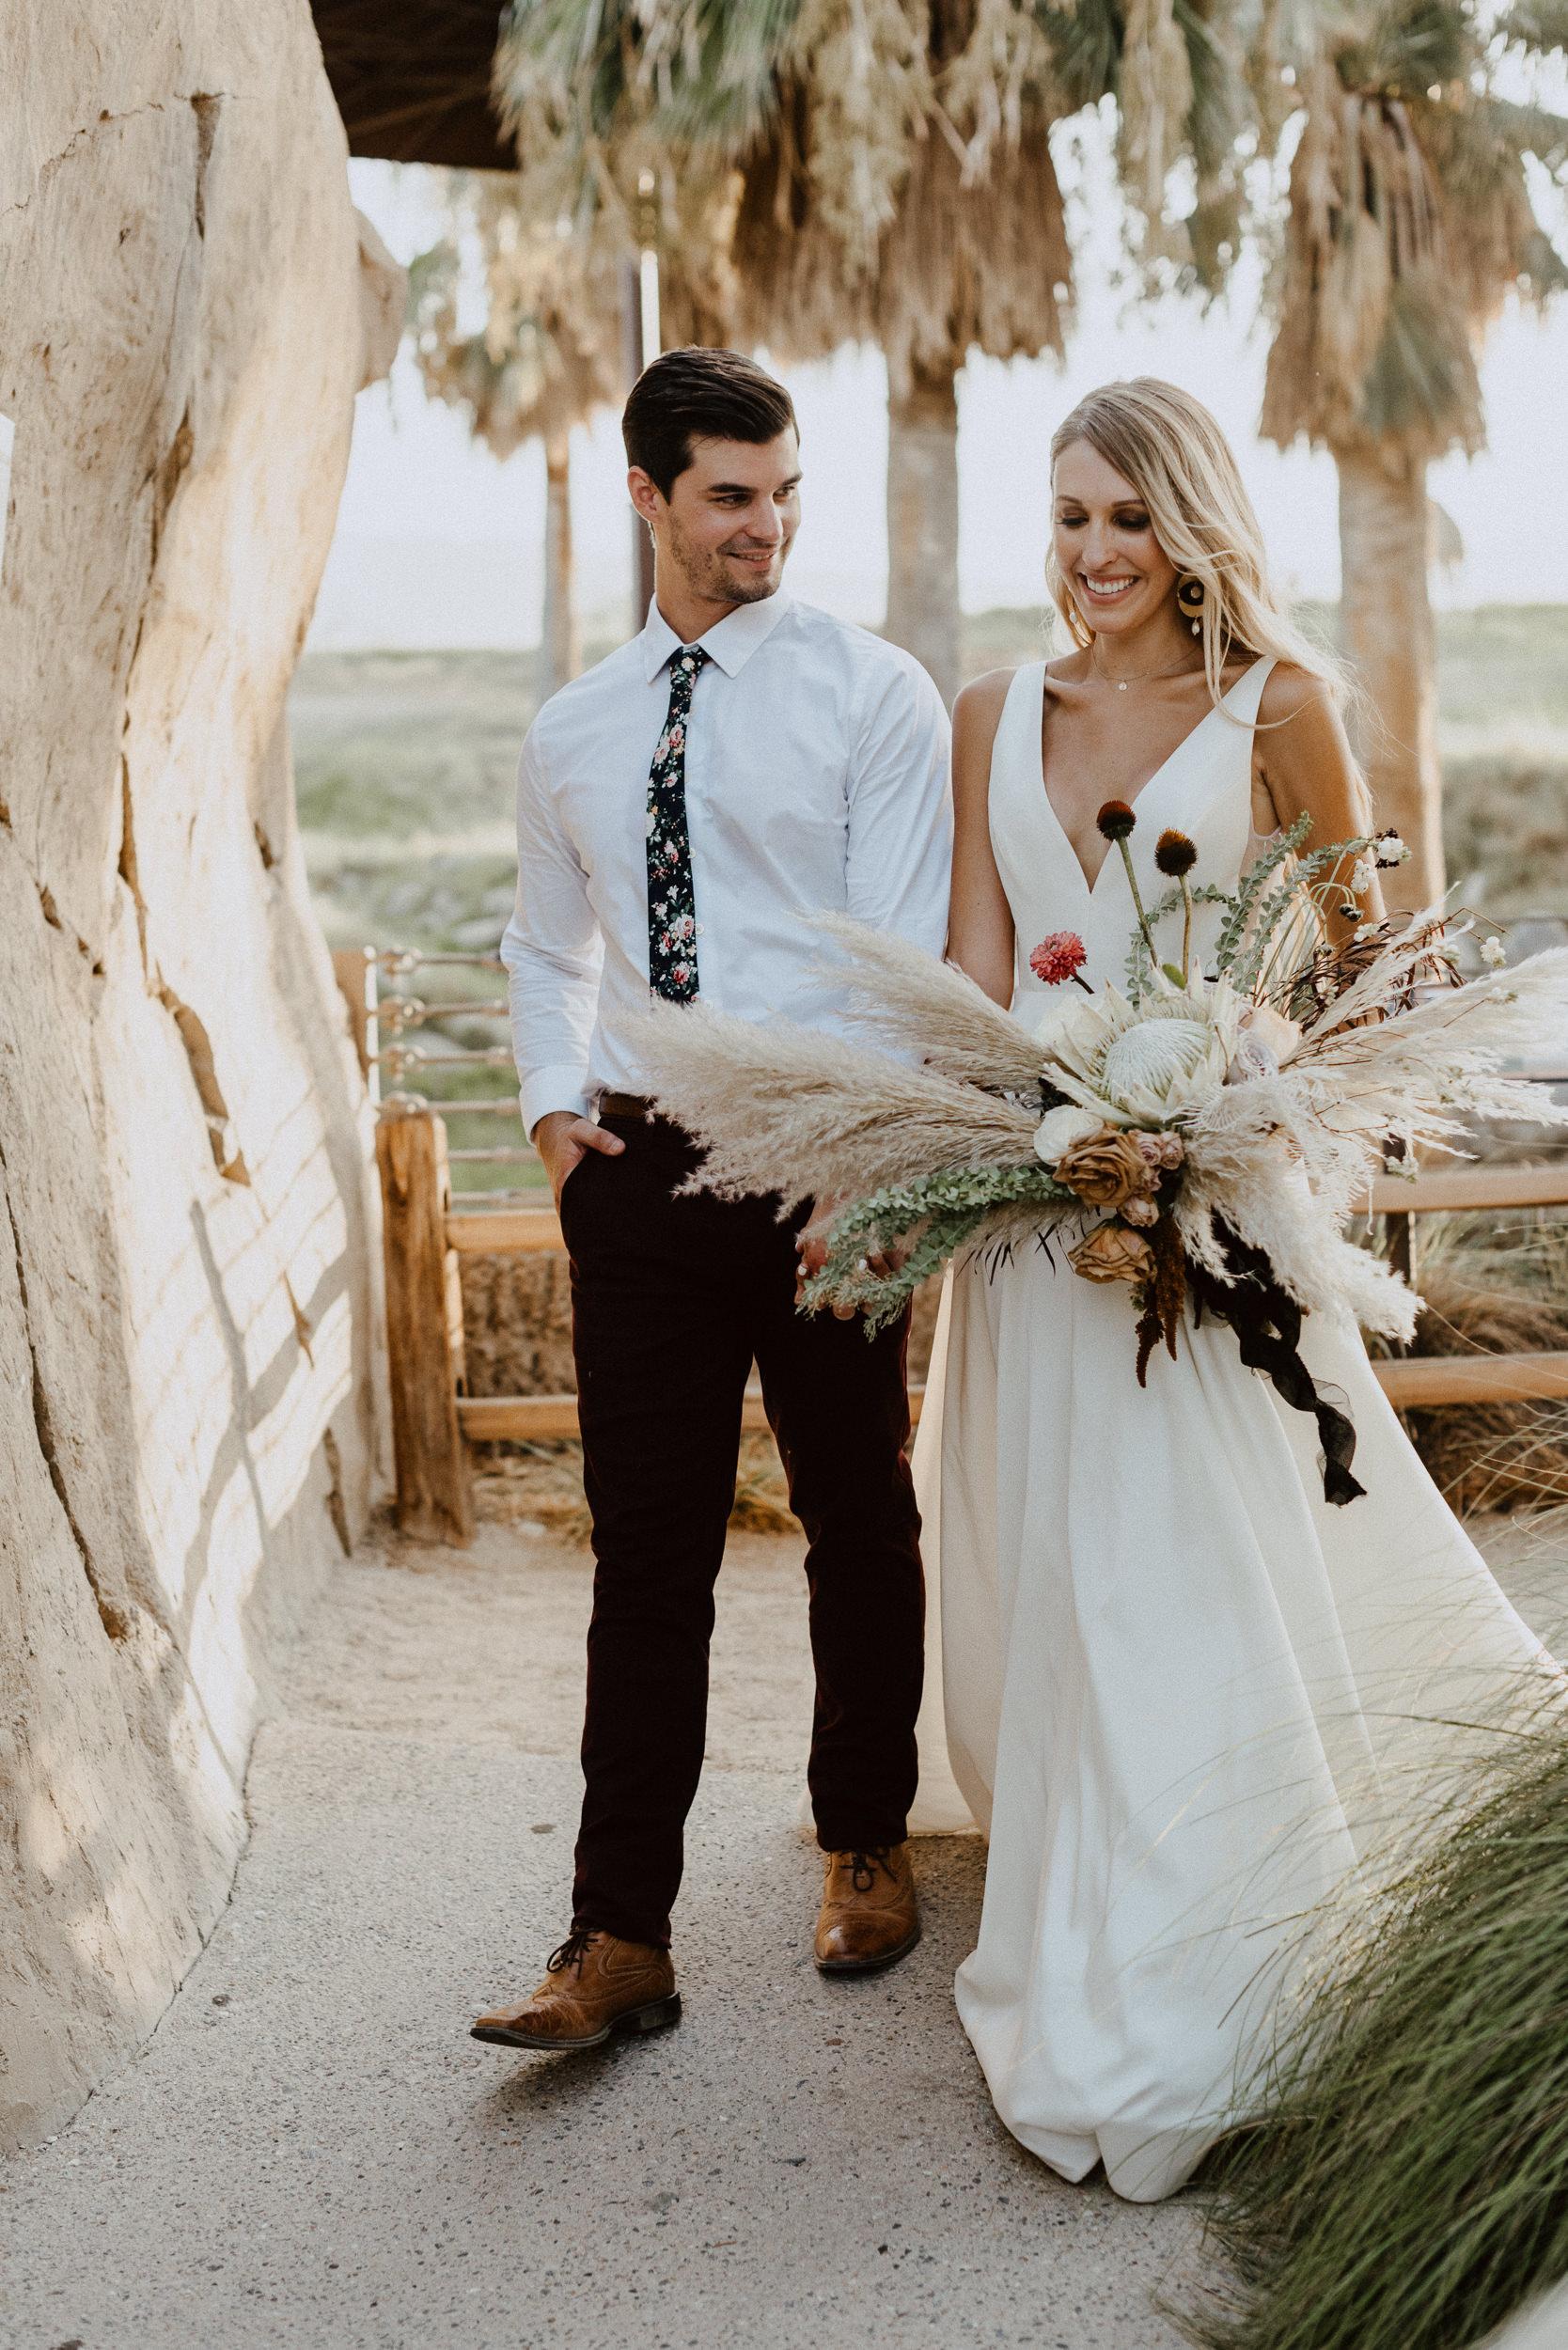 sChelsie + Chris - The Desert Shootout Wedding Romantics at The Living Desert-130.jpg